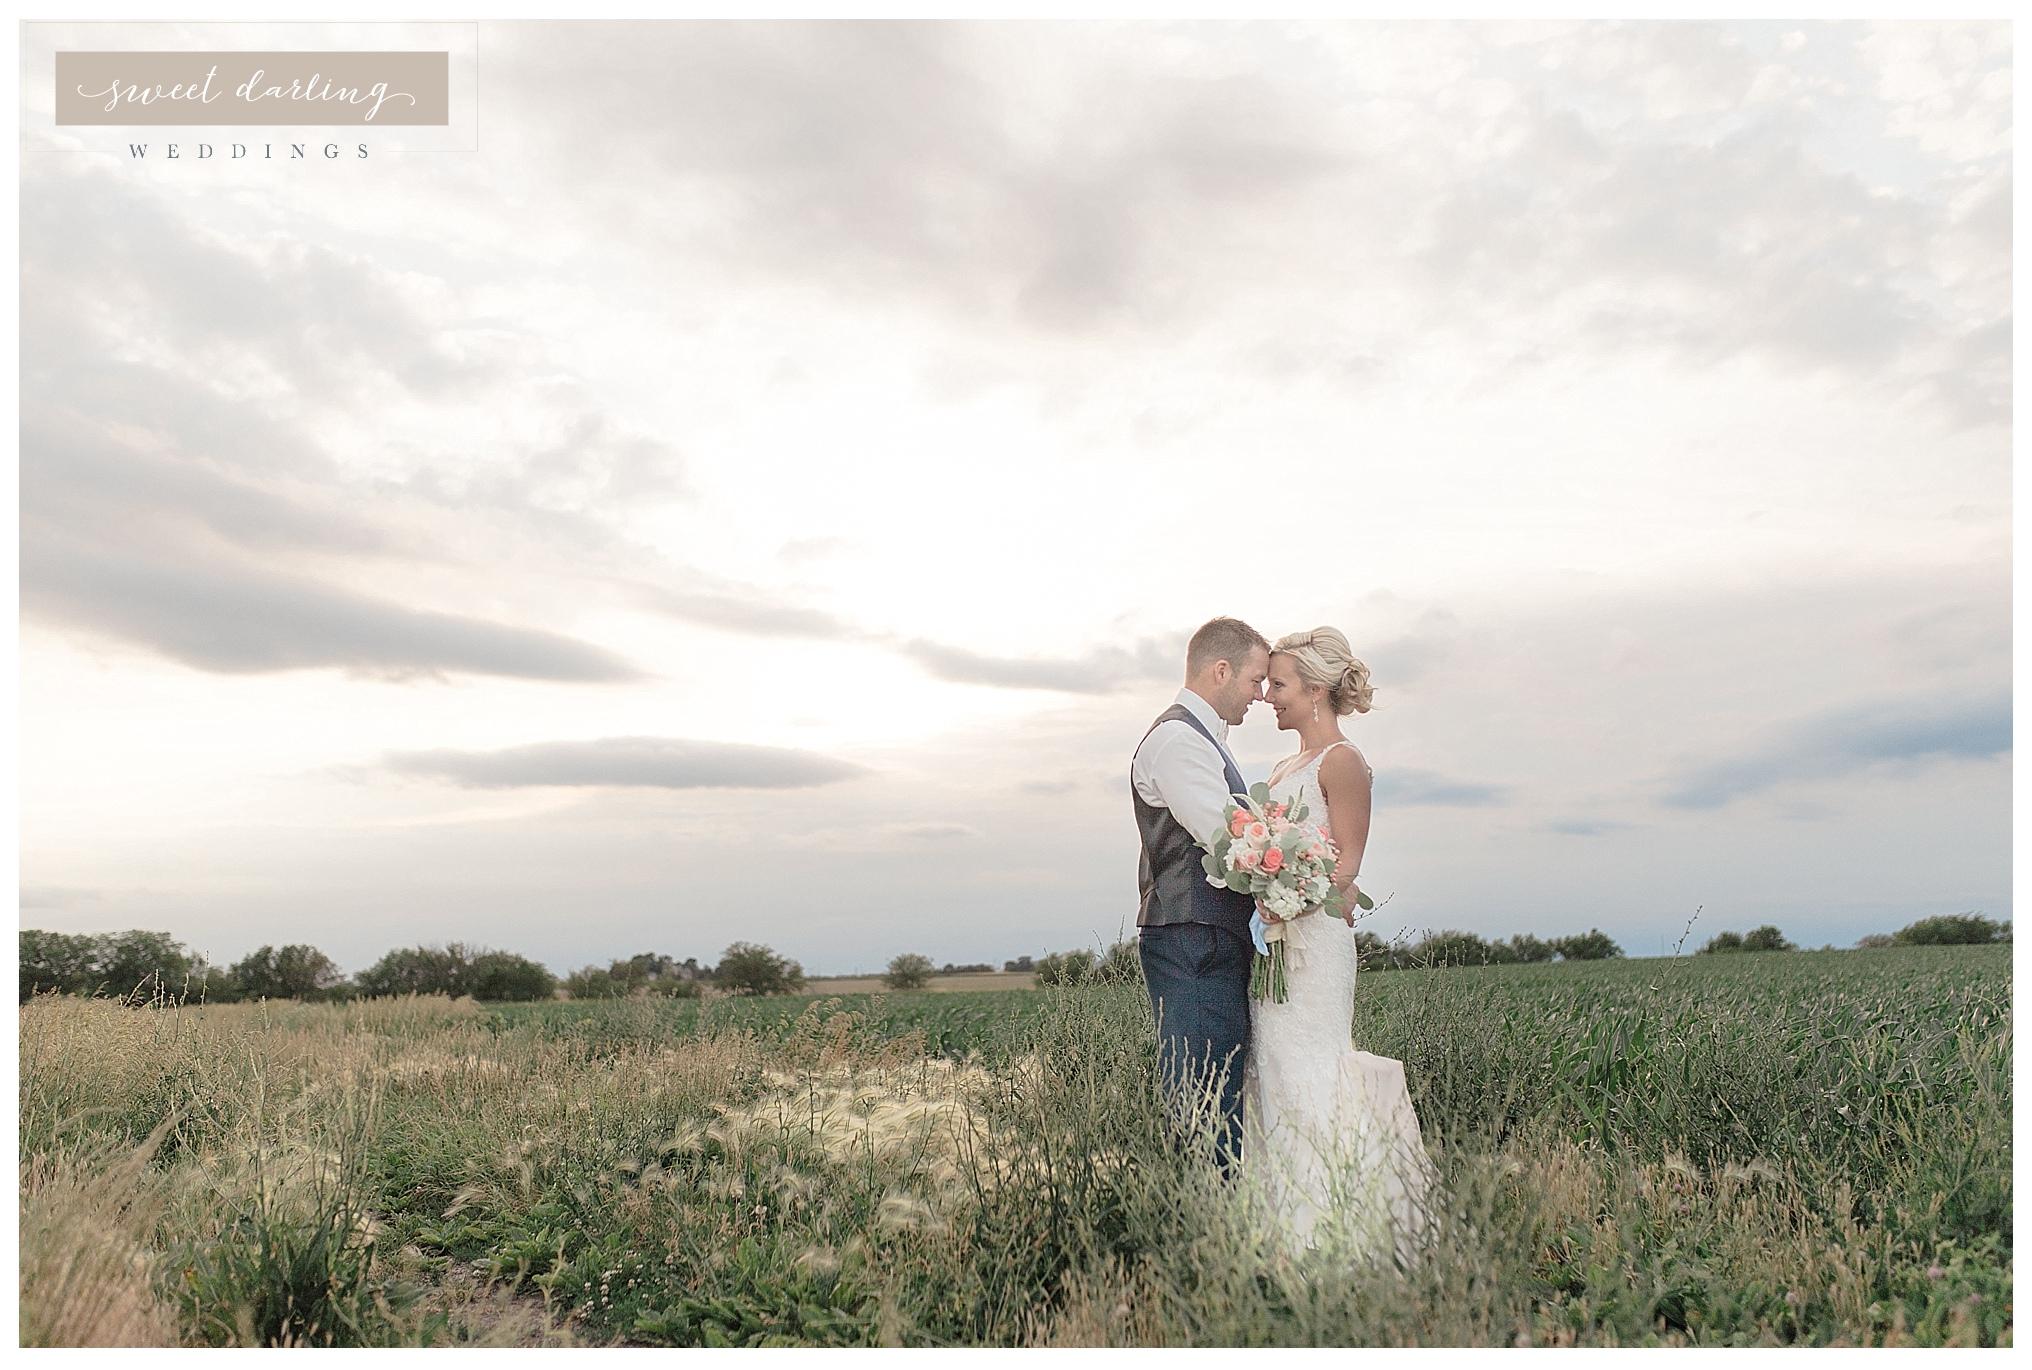 Paxton-illinois-engelbrecht-farmstead-romantic-wedding-photographer-sweet-darling-weddings_1234.jpg